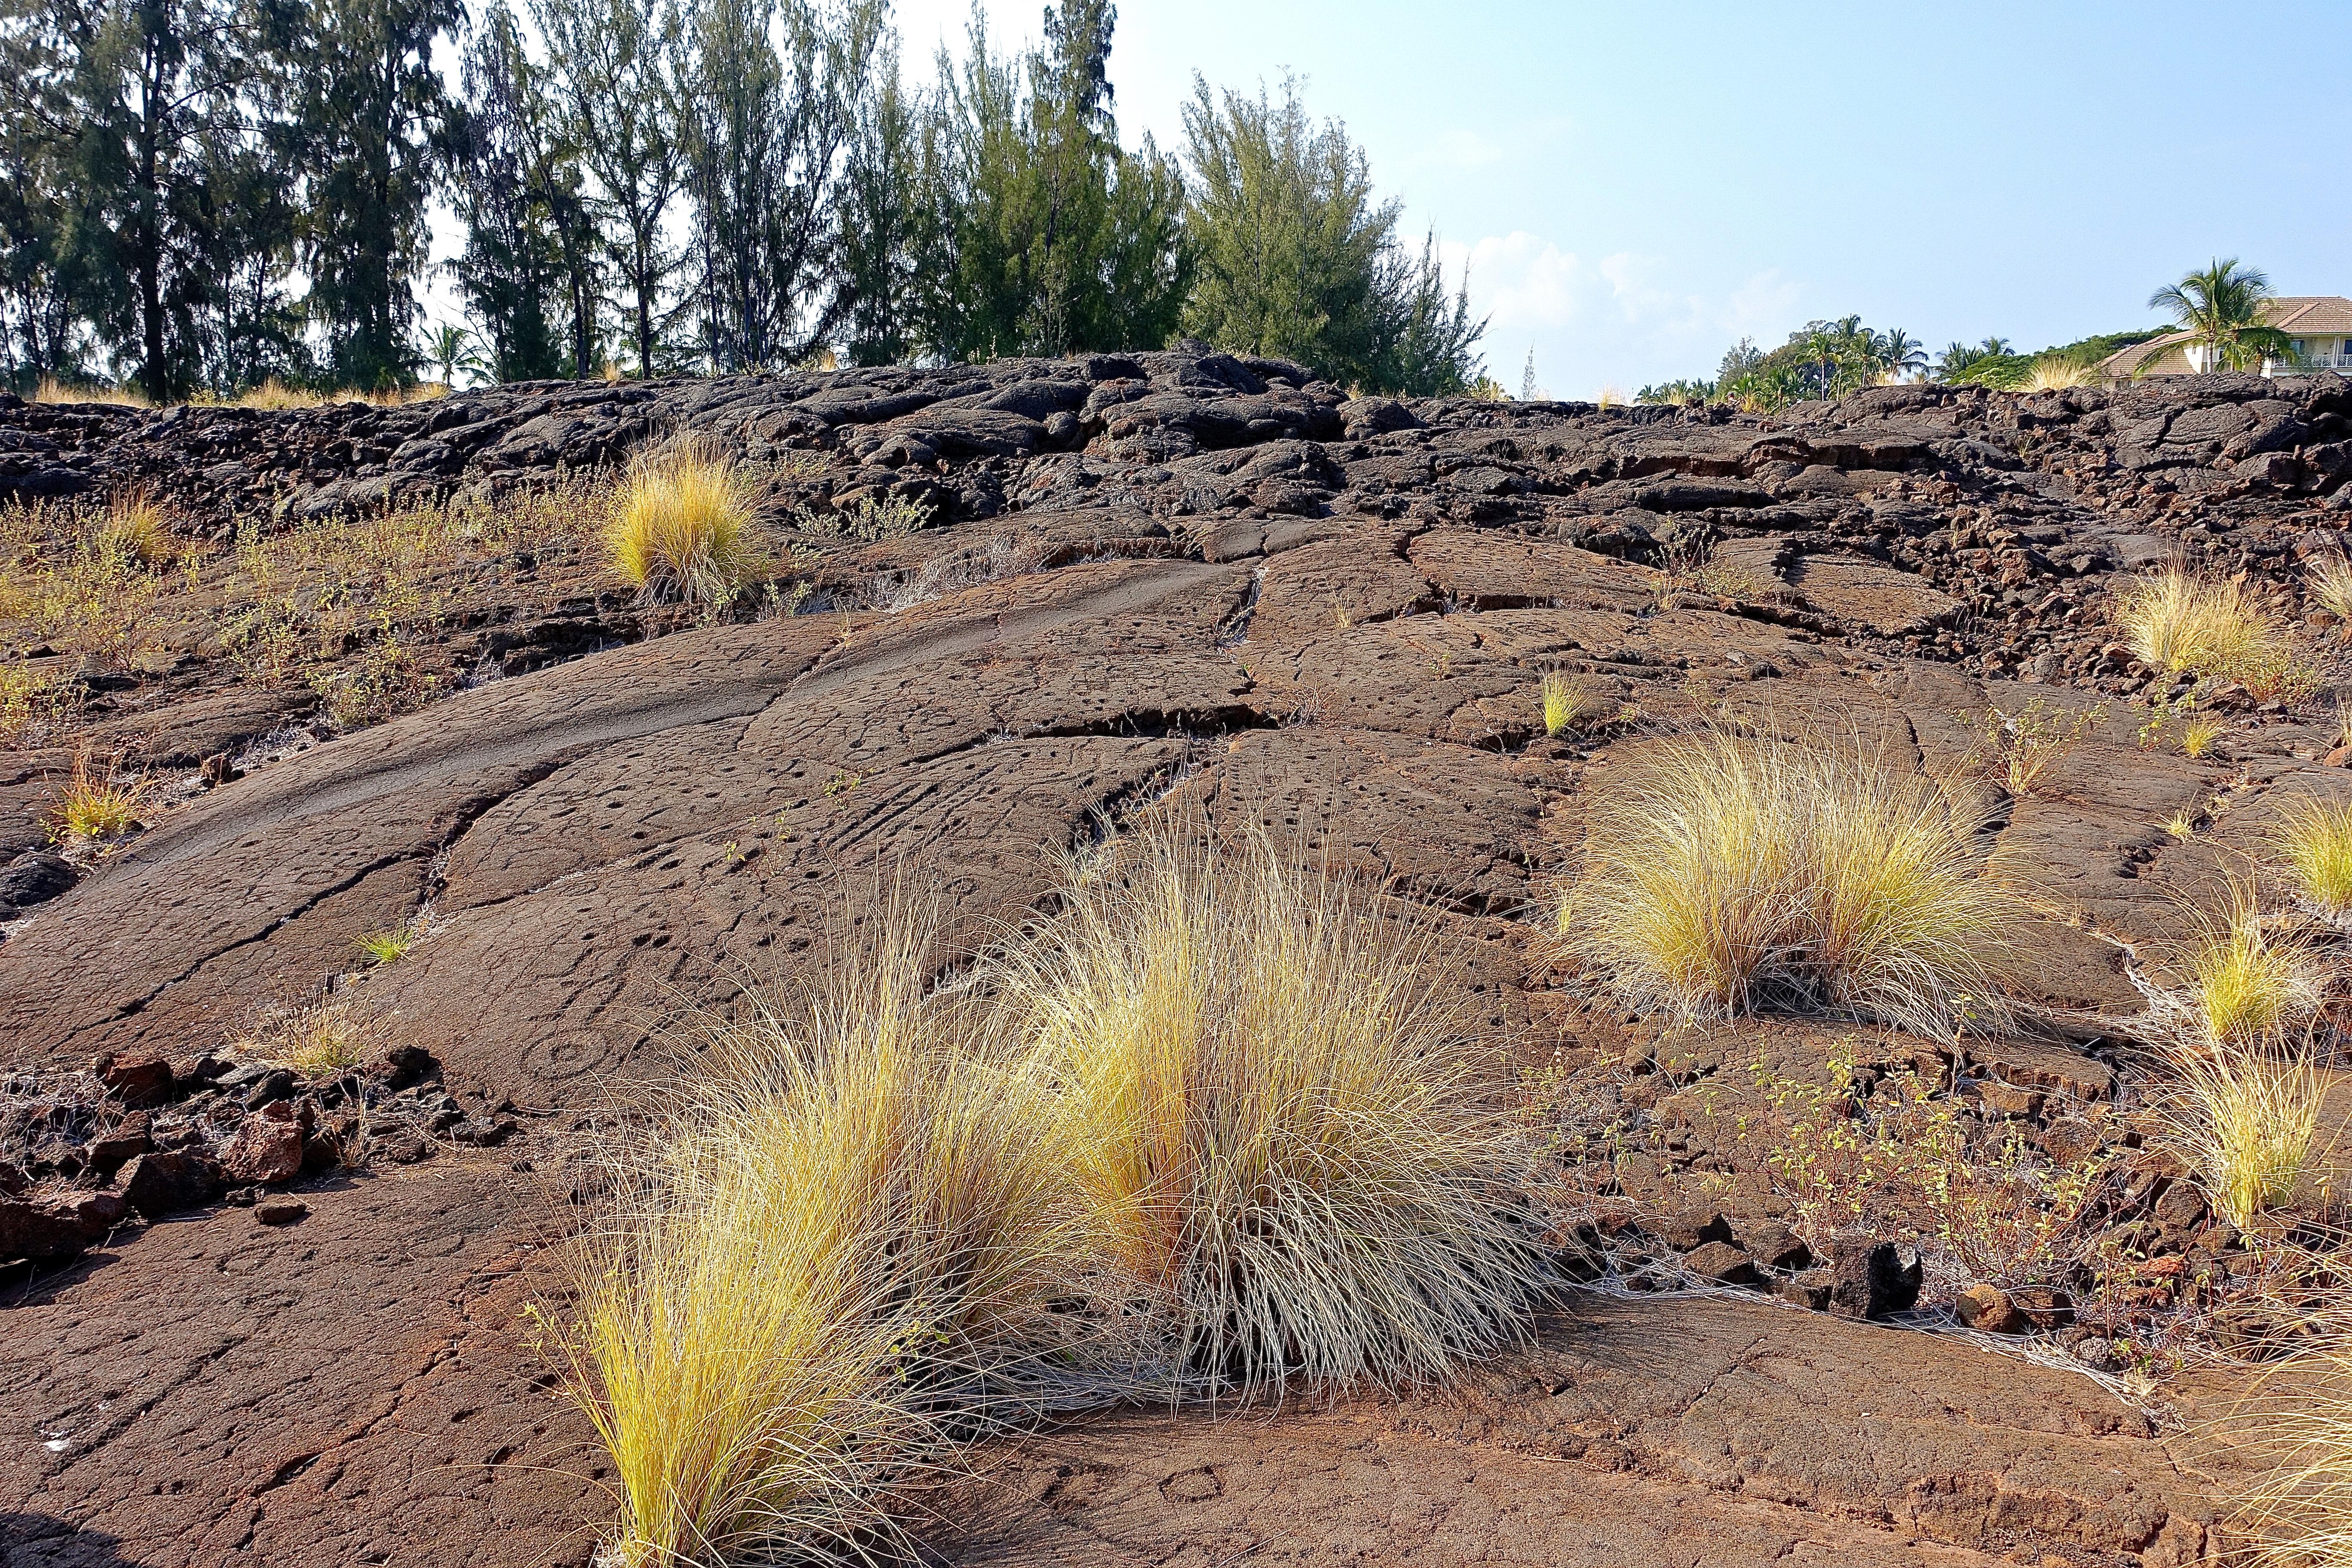 Thousands of petroglyphs. Petroglyph field near Waikoloa